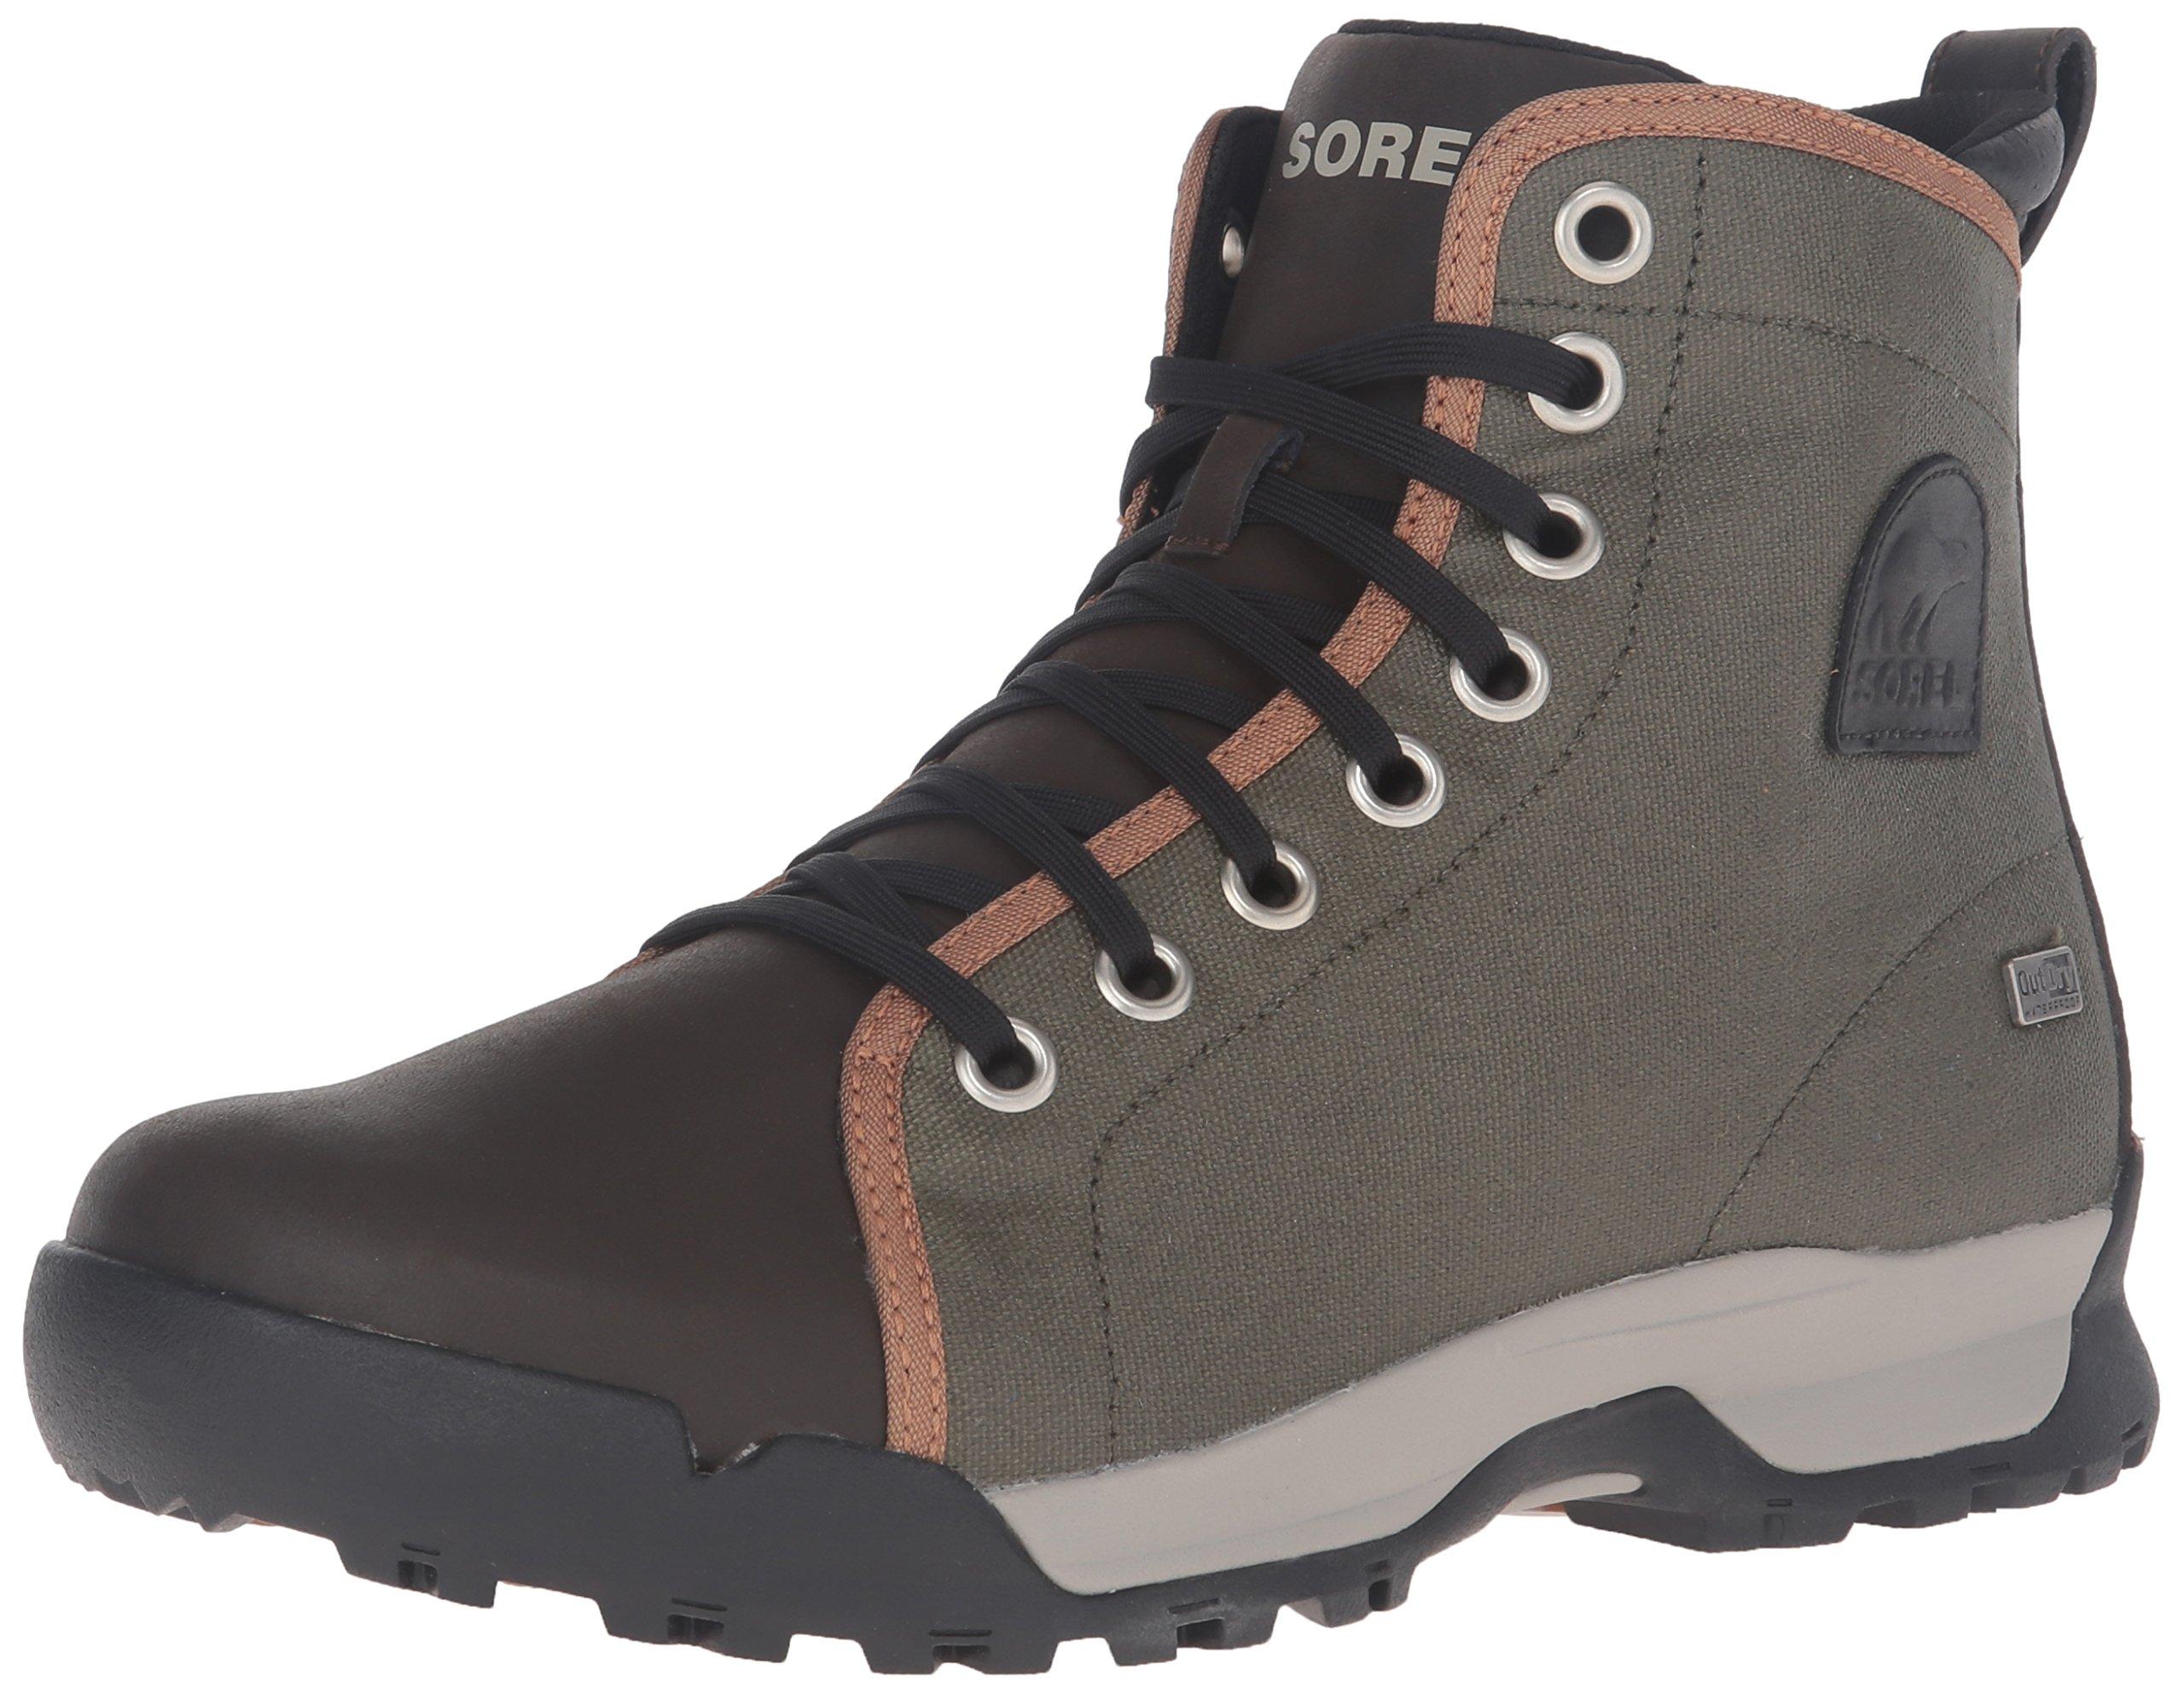 Sorel Men's Paxson 64 Outdry Snow Boot, Nori, Elk, 12 D US